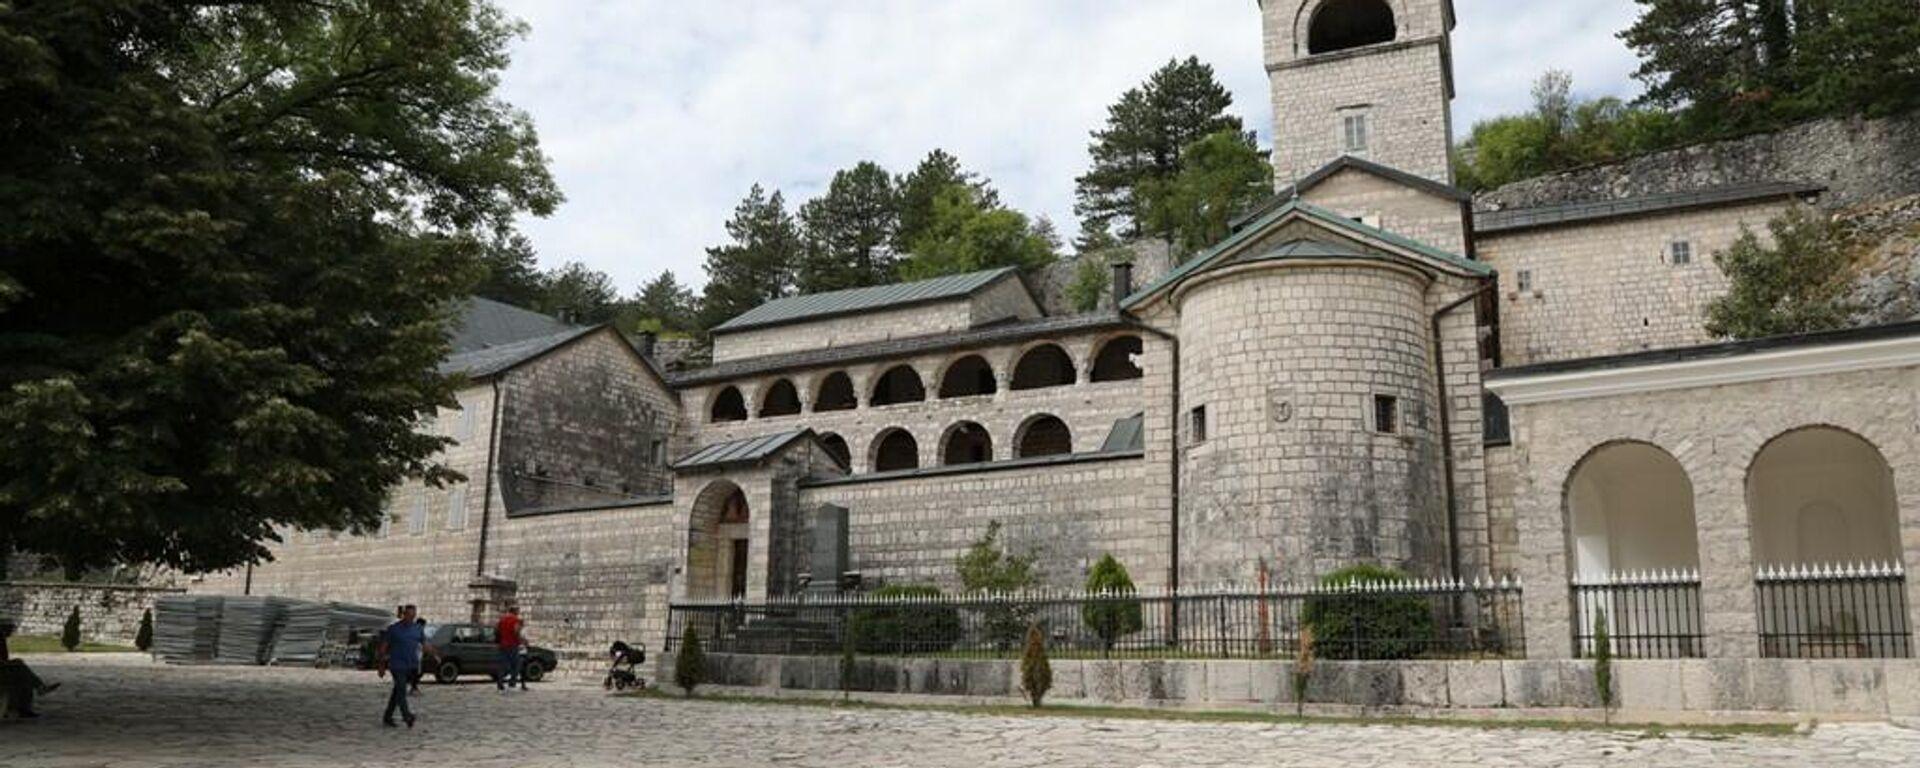 Poslednje pripreme pred ustoličenje mitropolita Joanikija u Cetinjskom manastiru - Sputnik Srbija, 1920, 14.09.2021